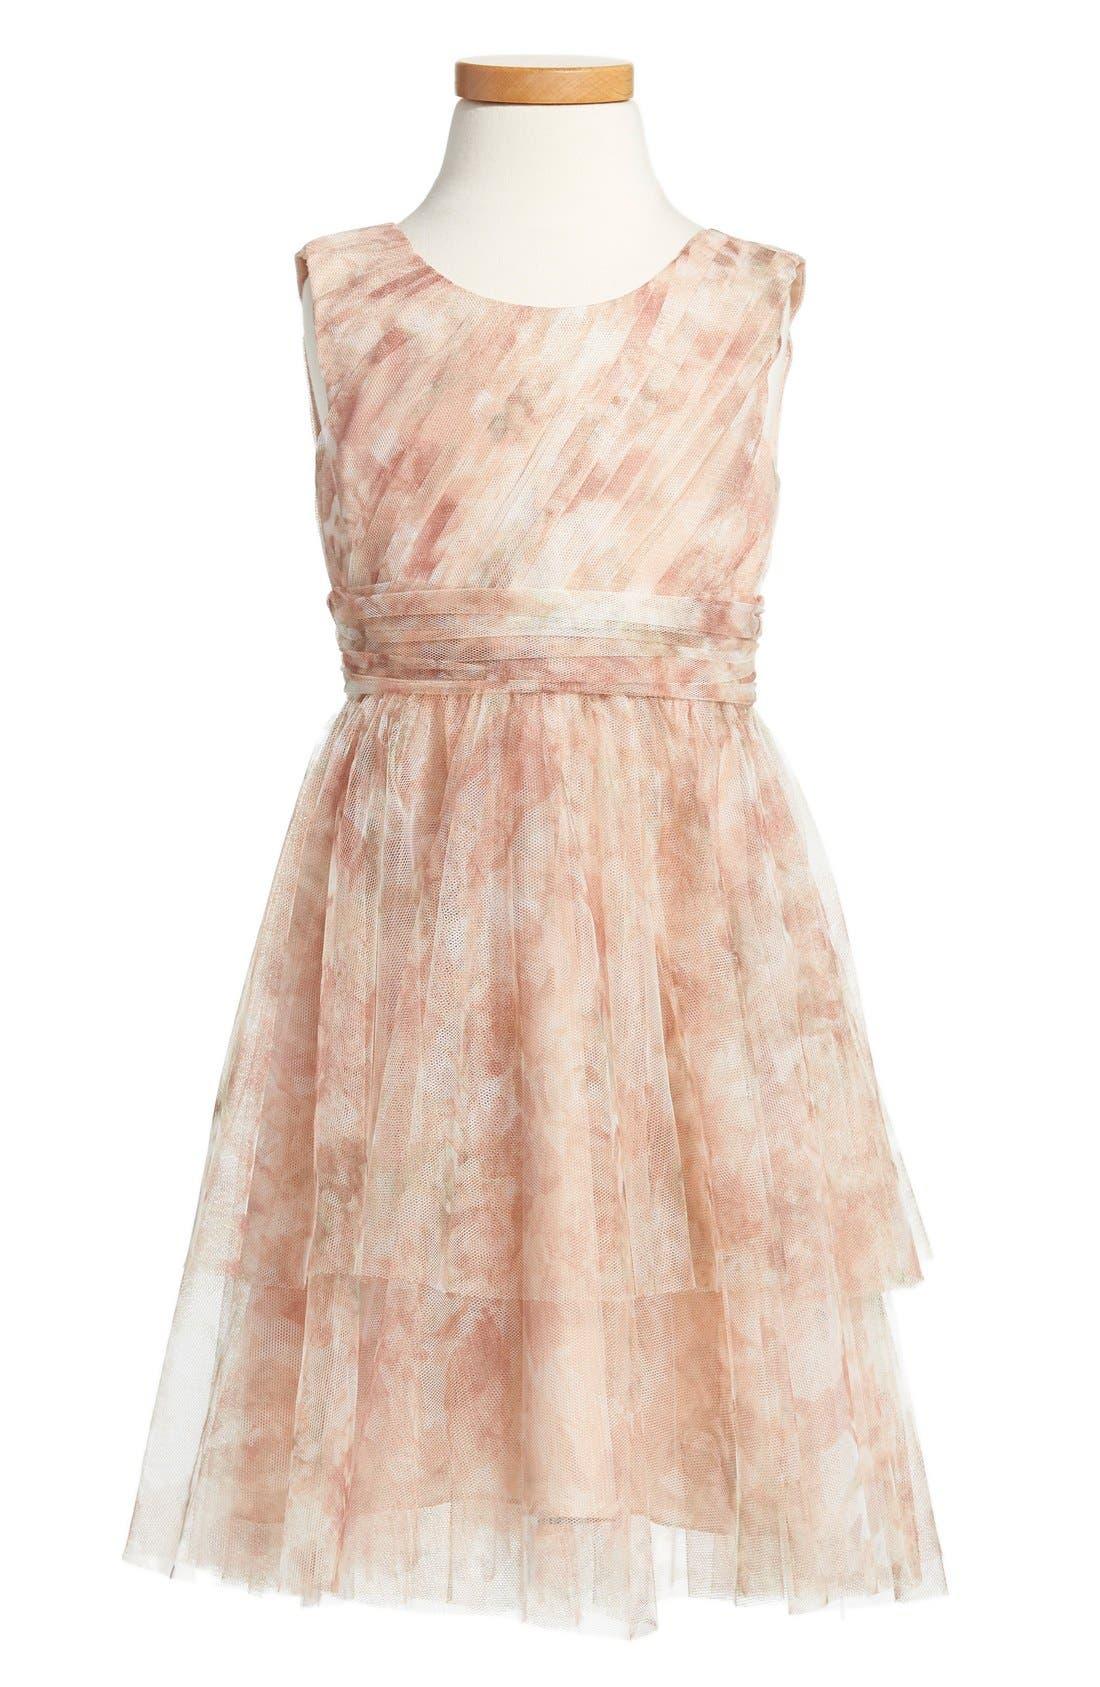 JENNY YOO 'Etsy - Vintage Floral' Tulle Dress